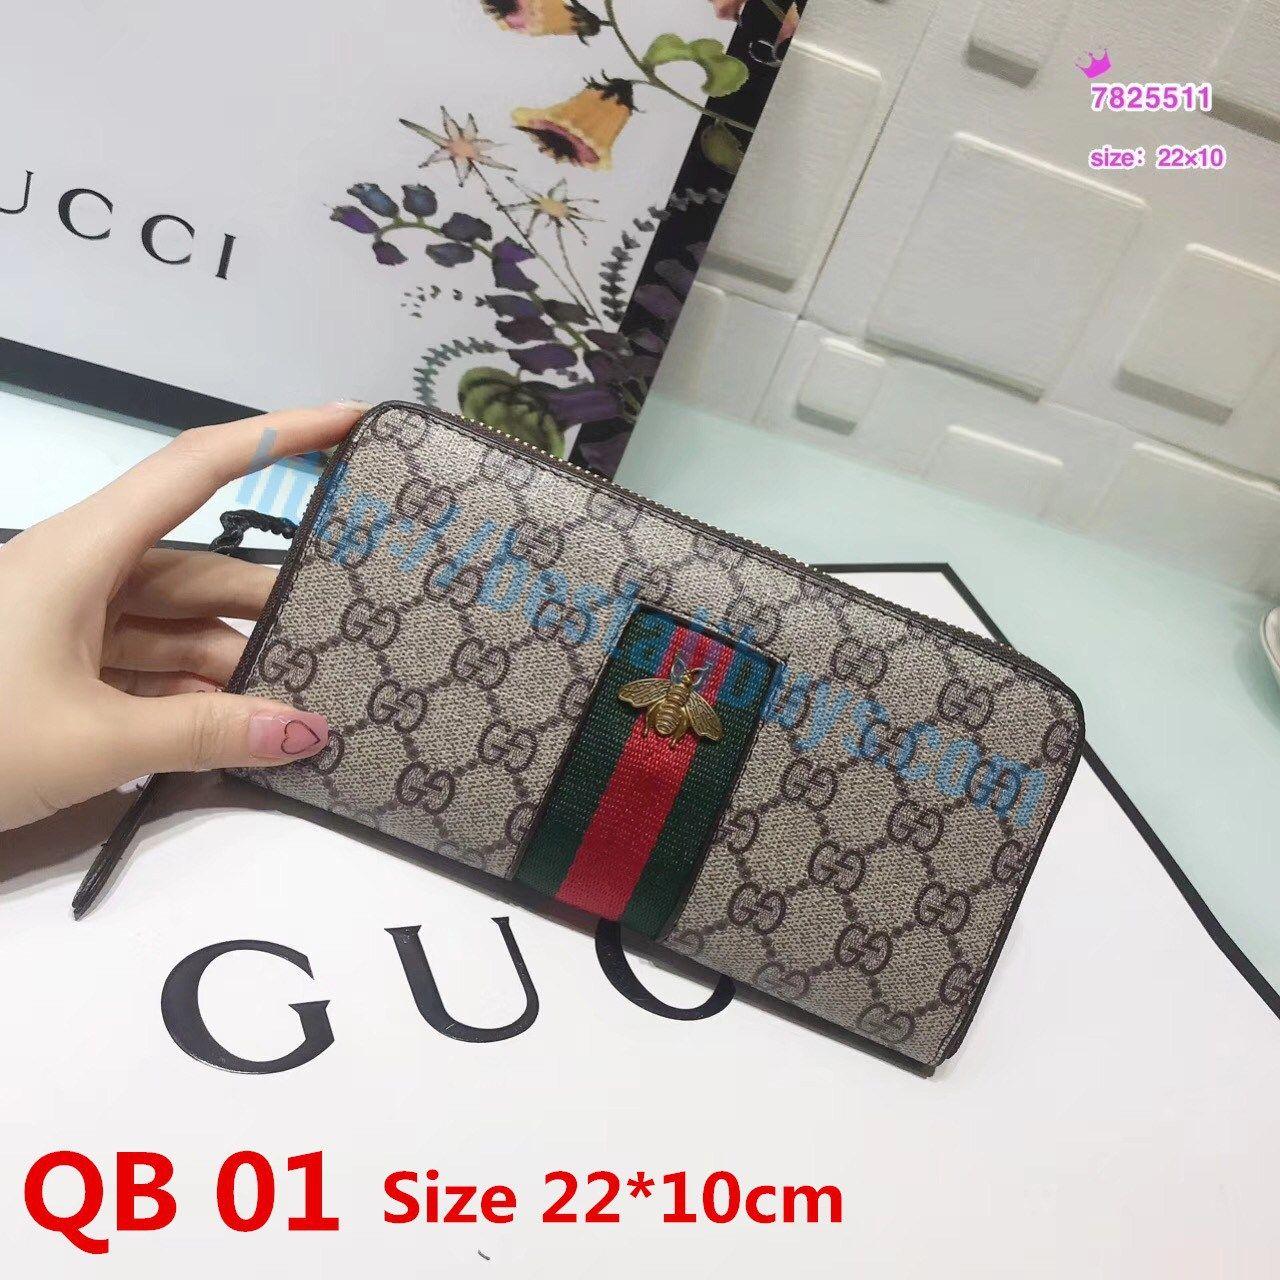 64e03a706df2 QB 01-QB 09 Gucci Wallet No Box on Aliexpress - Hidden Link   Price       FREE Shipping     aliexpressbrand